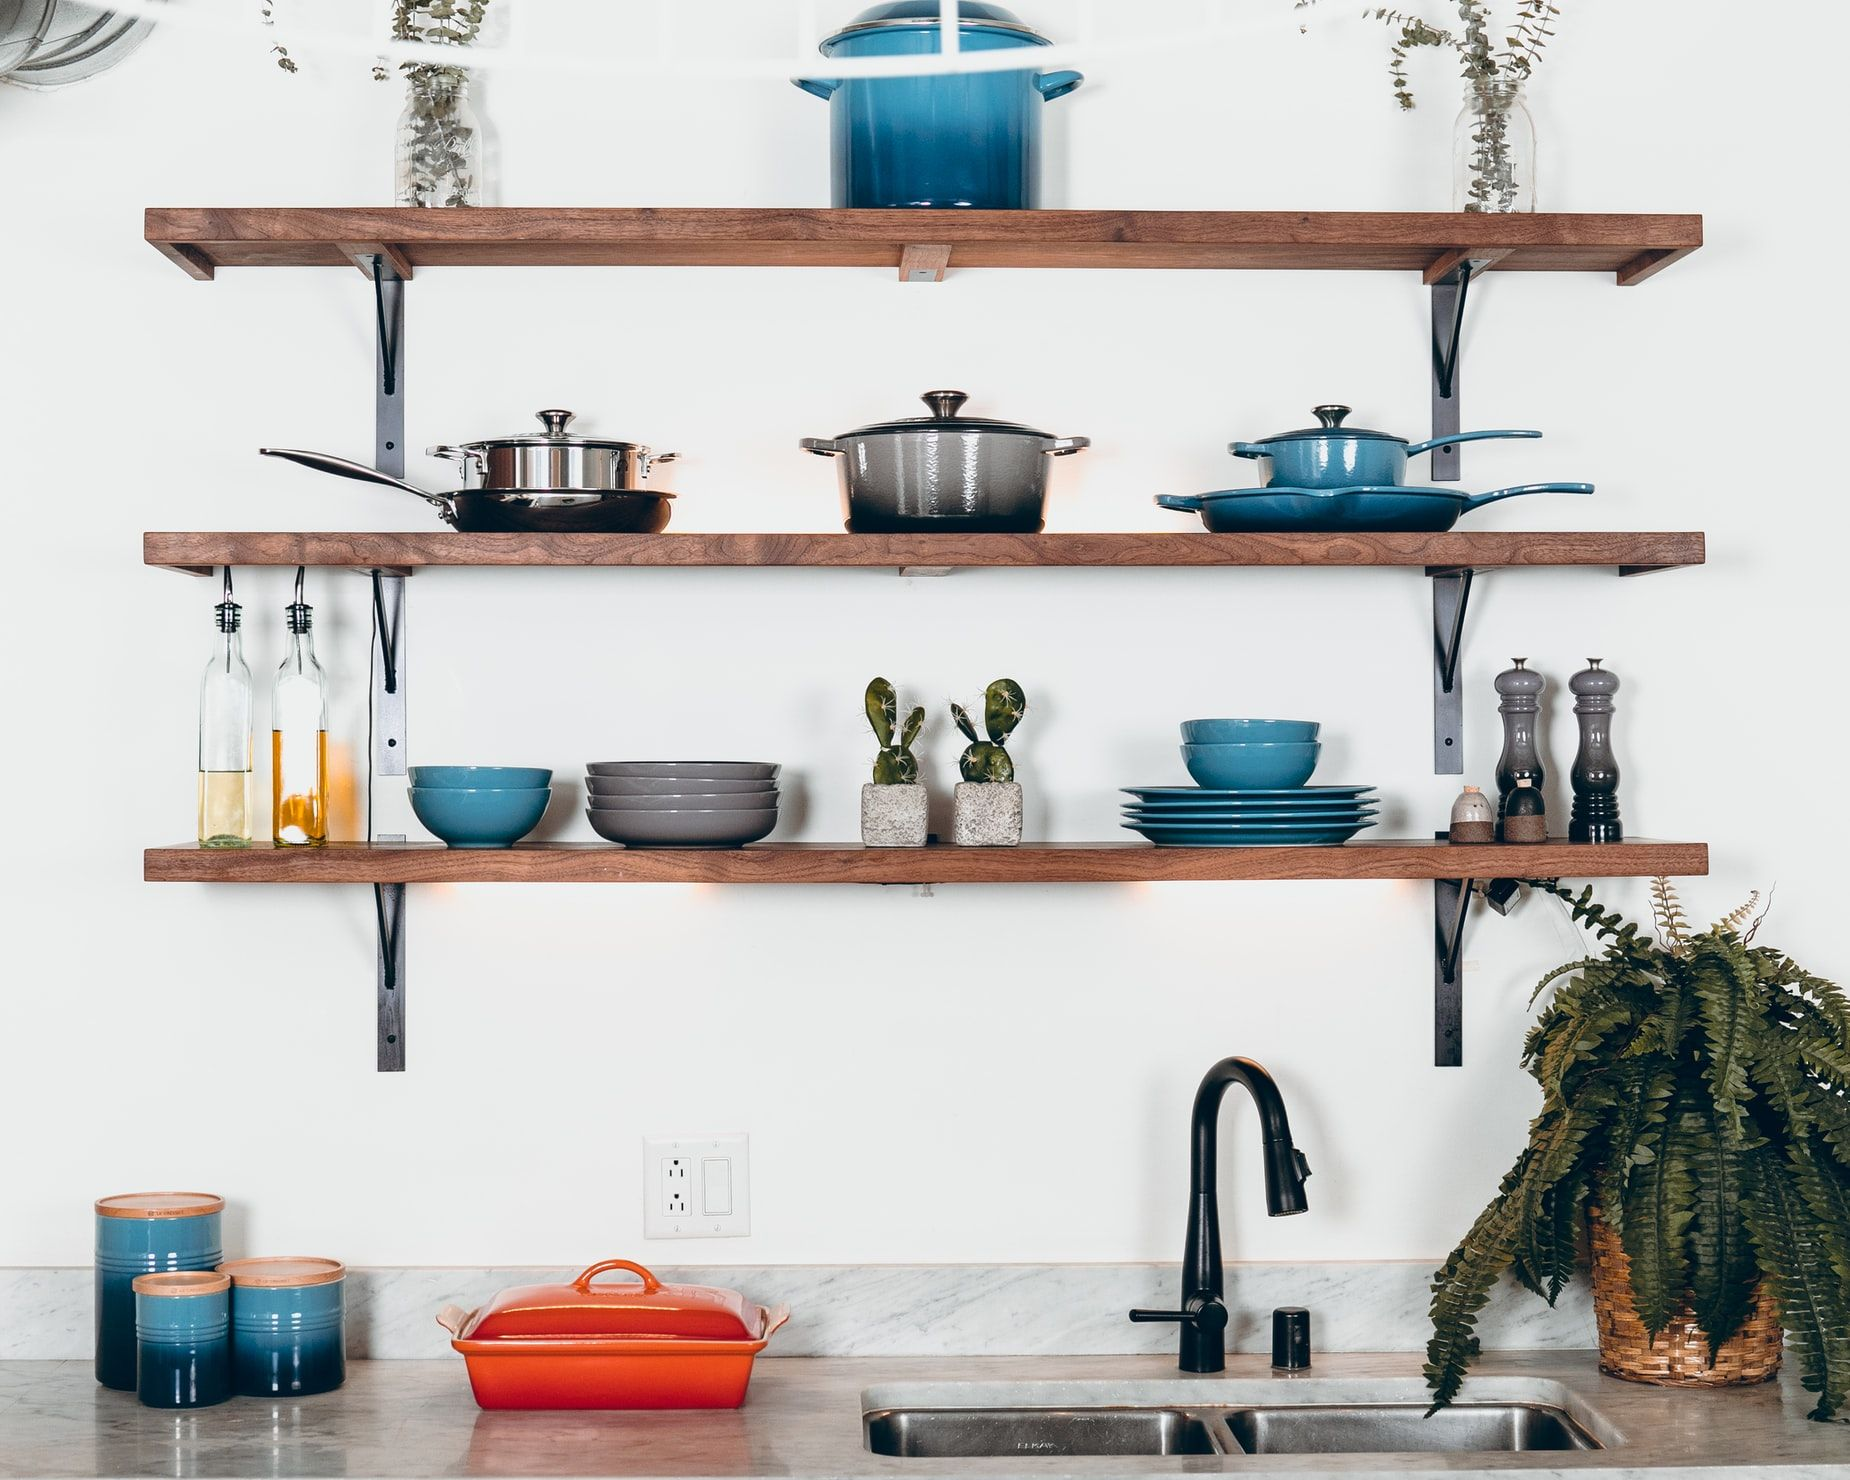 Colourful kitchen materials (Photo: Dane Deaner on Unsplash)